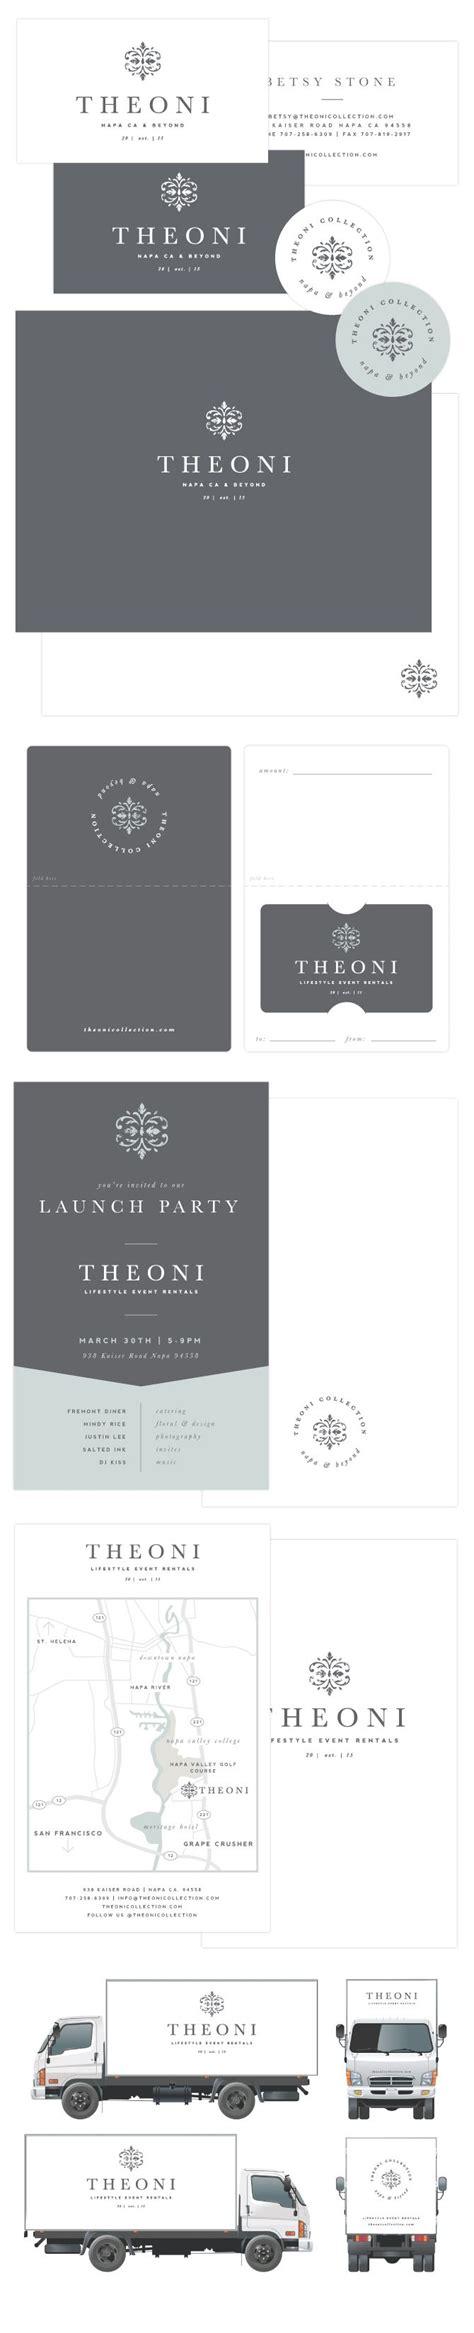 brand launch theoni  images identity design